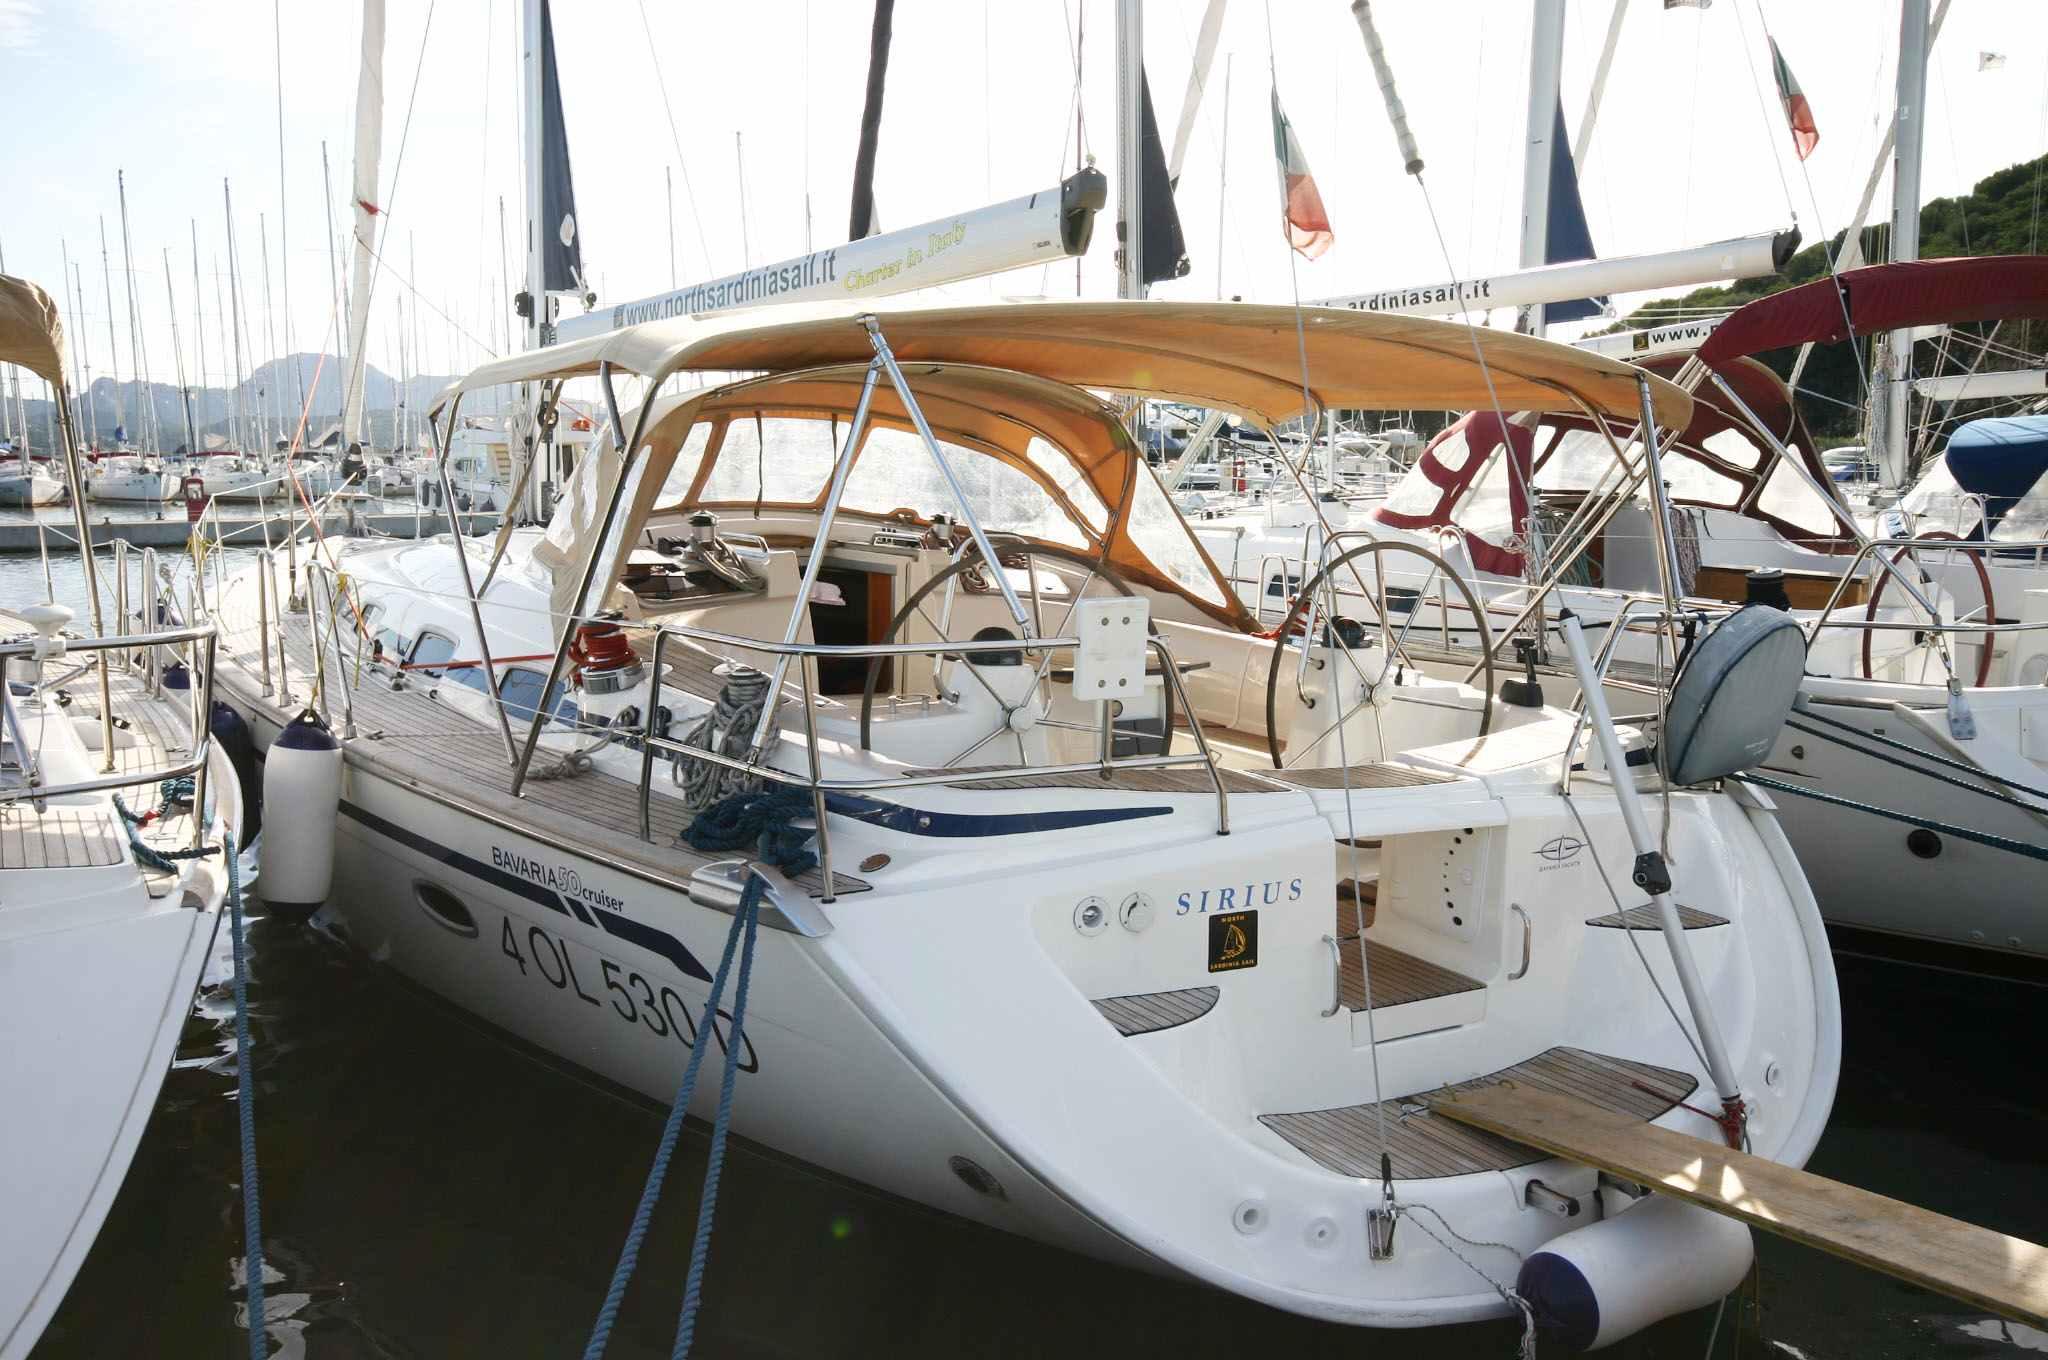 Bavaria 50 Cruiser (Sirius)